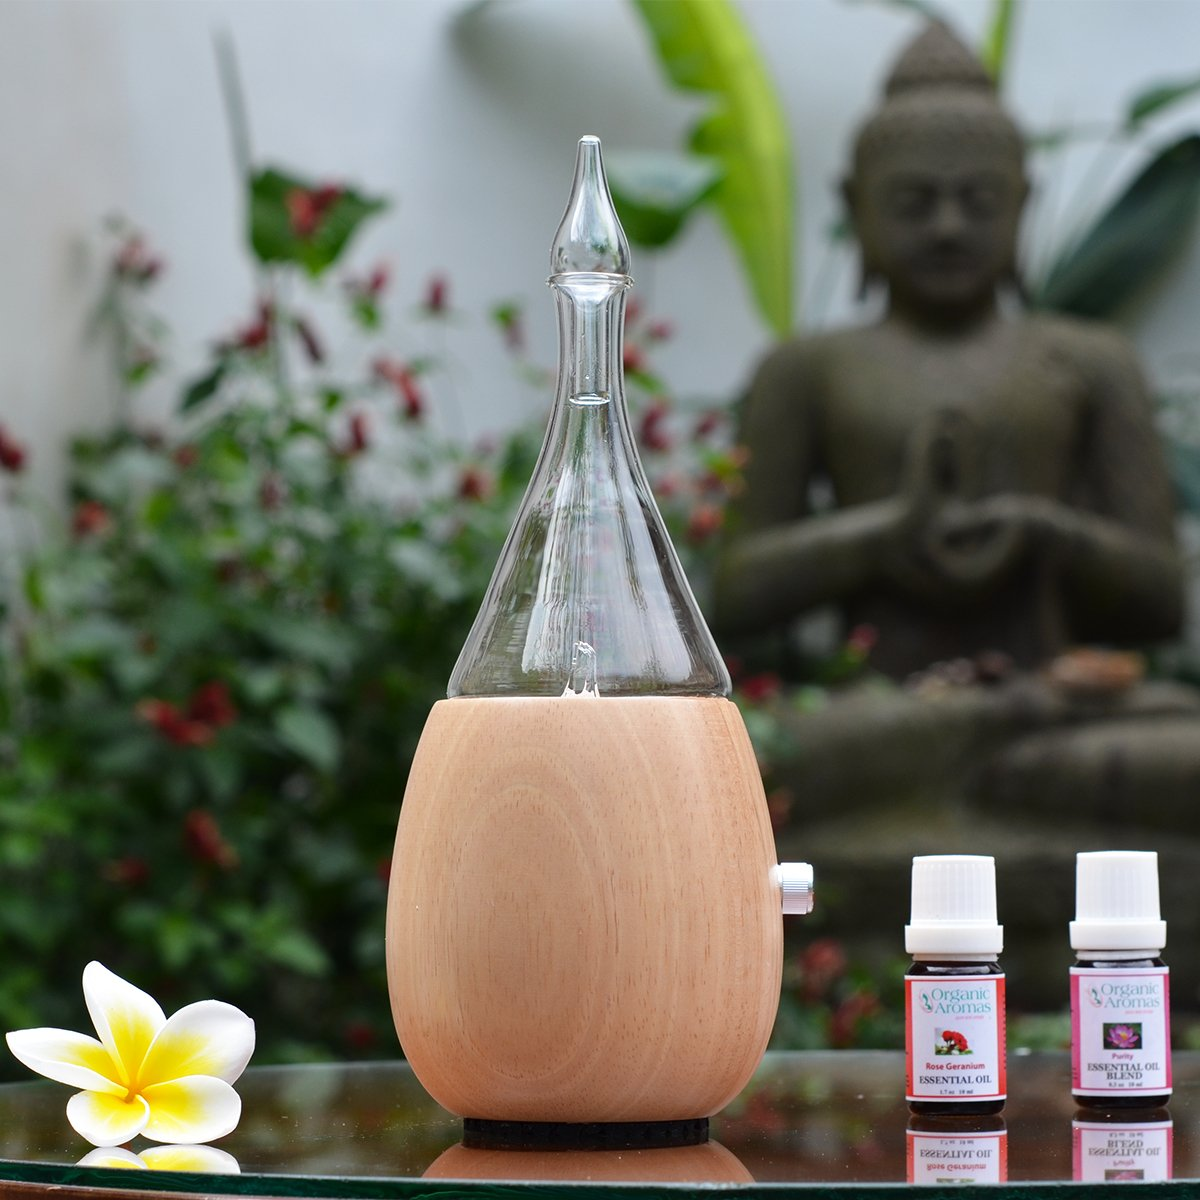 Trillia BEEVEY Handmade Wooden Essential Oil Diffuser